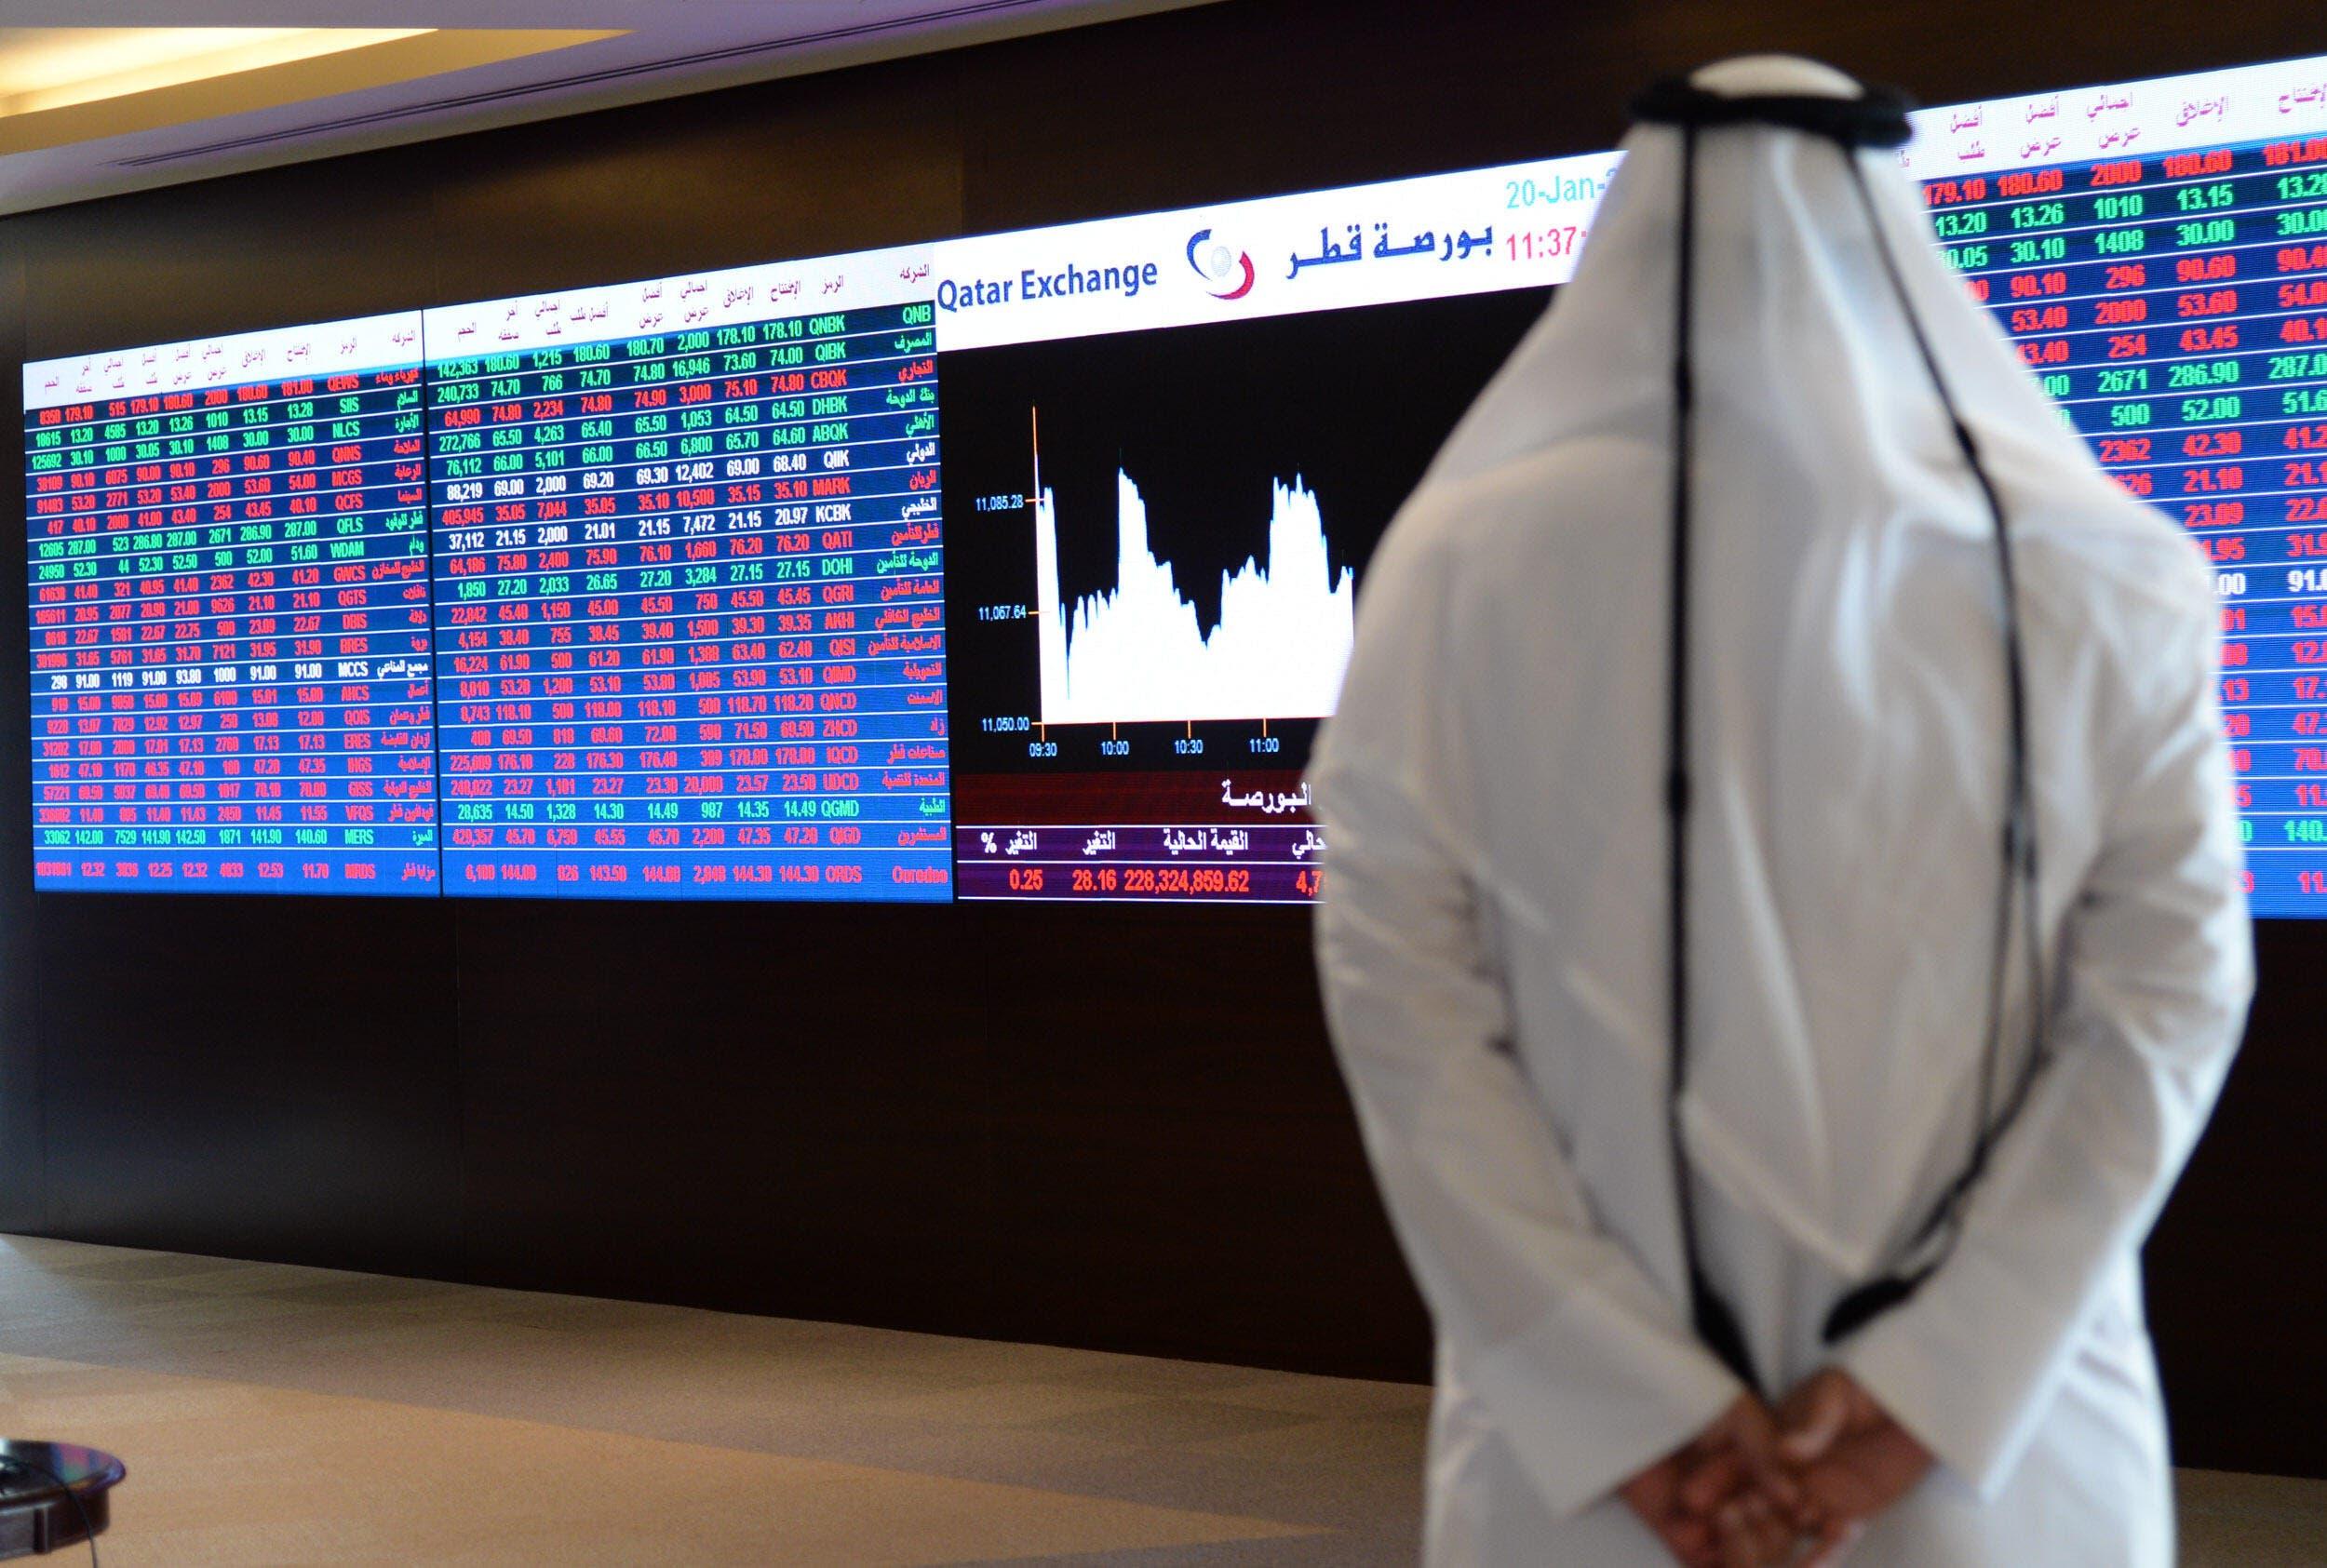 Profits of Qatari Listed Companies Reach QR 23.8 Billion in Q3 of 2020